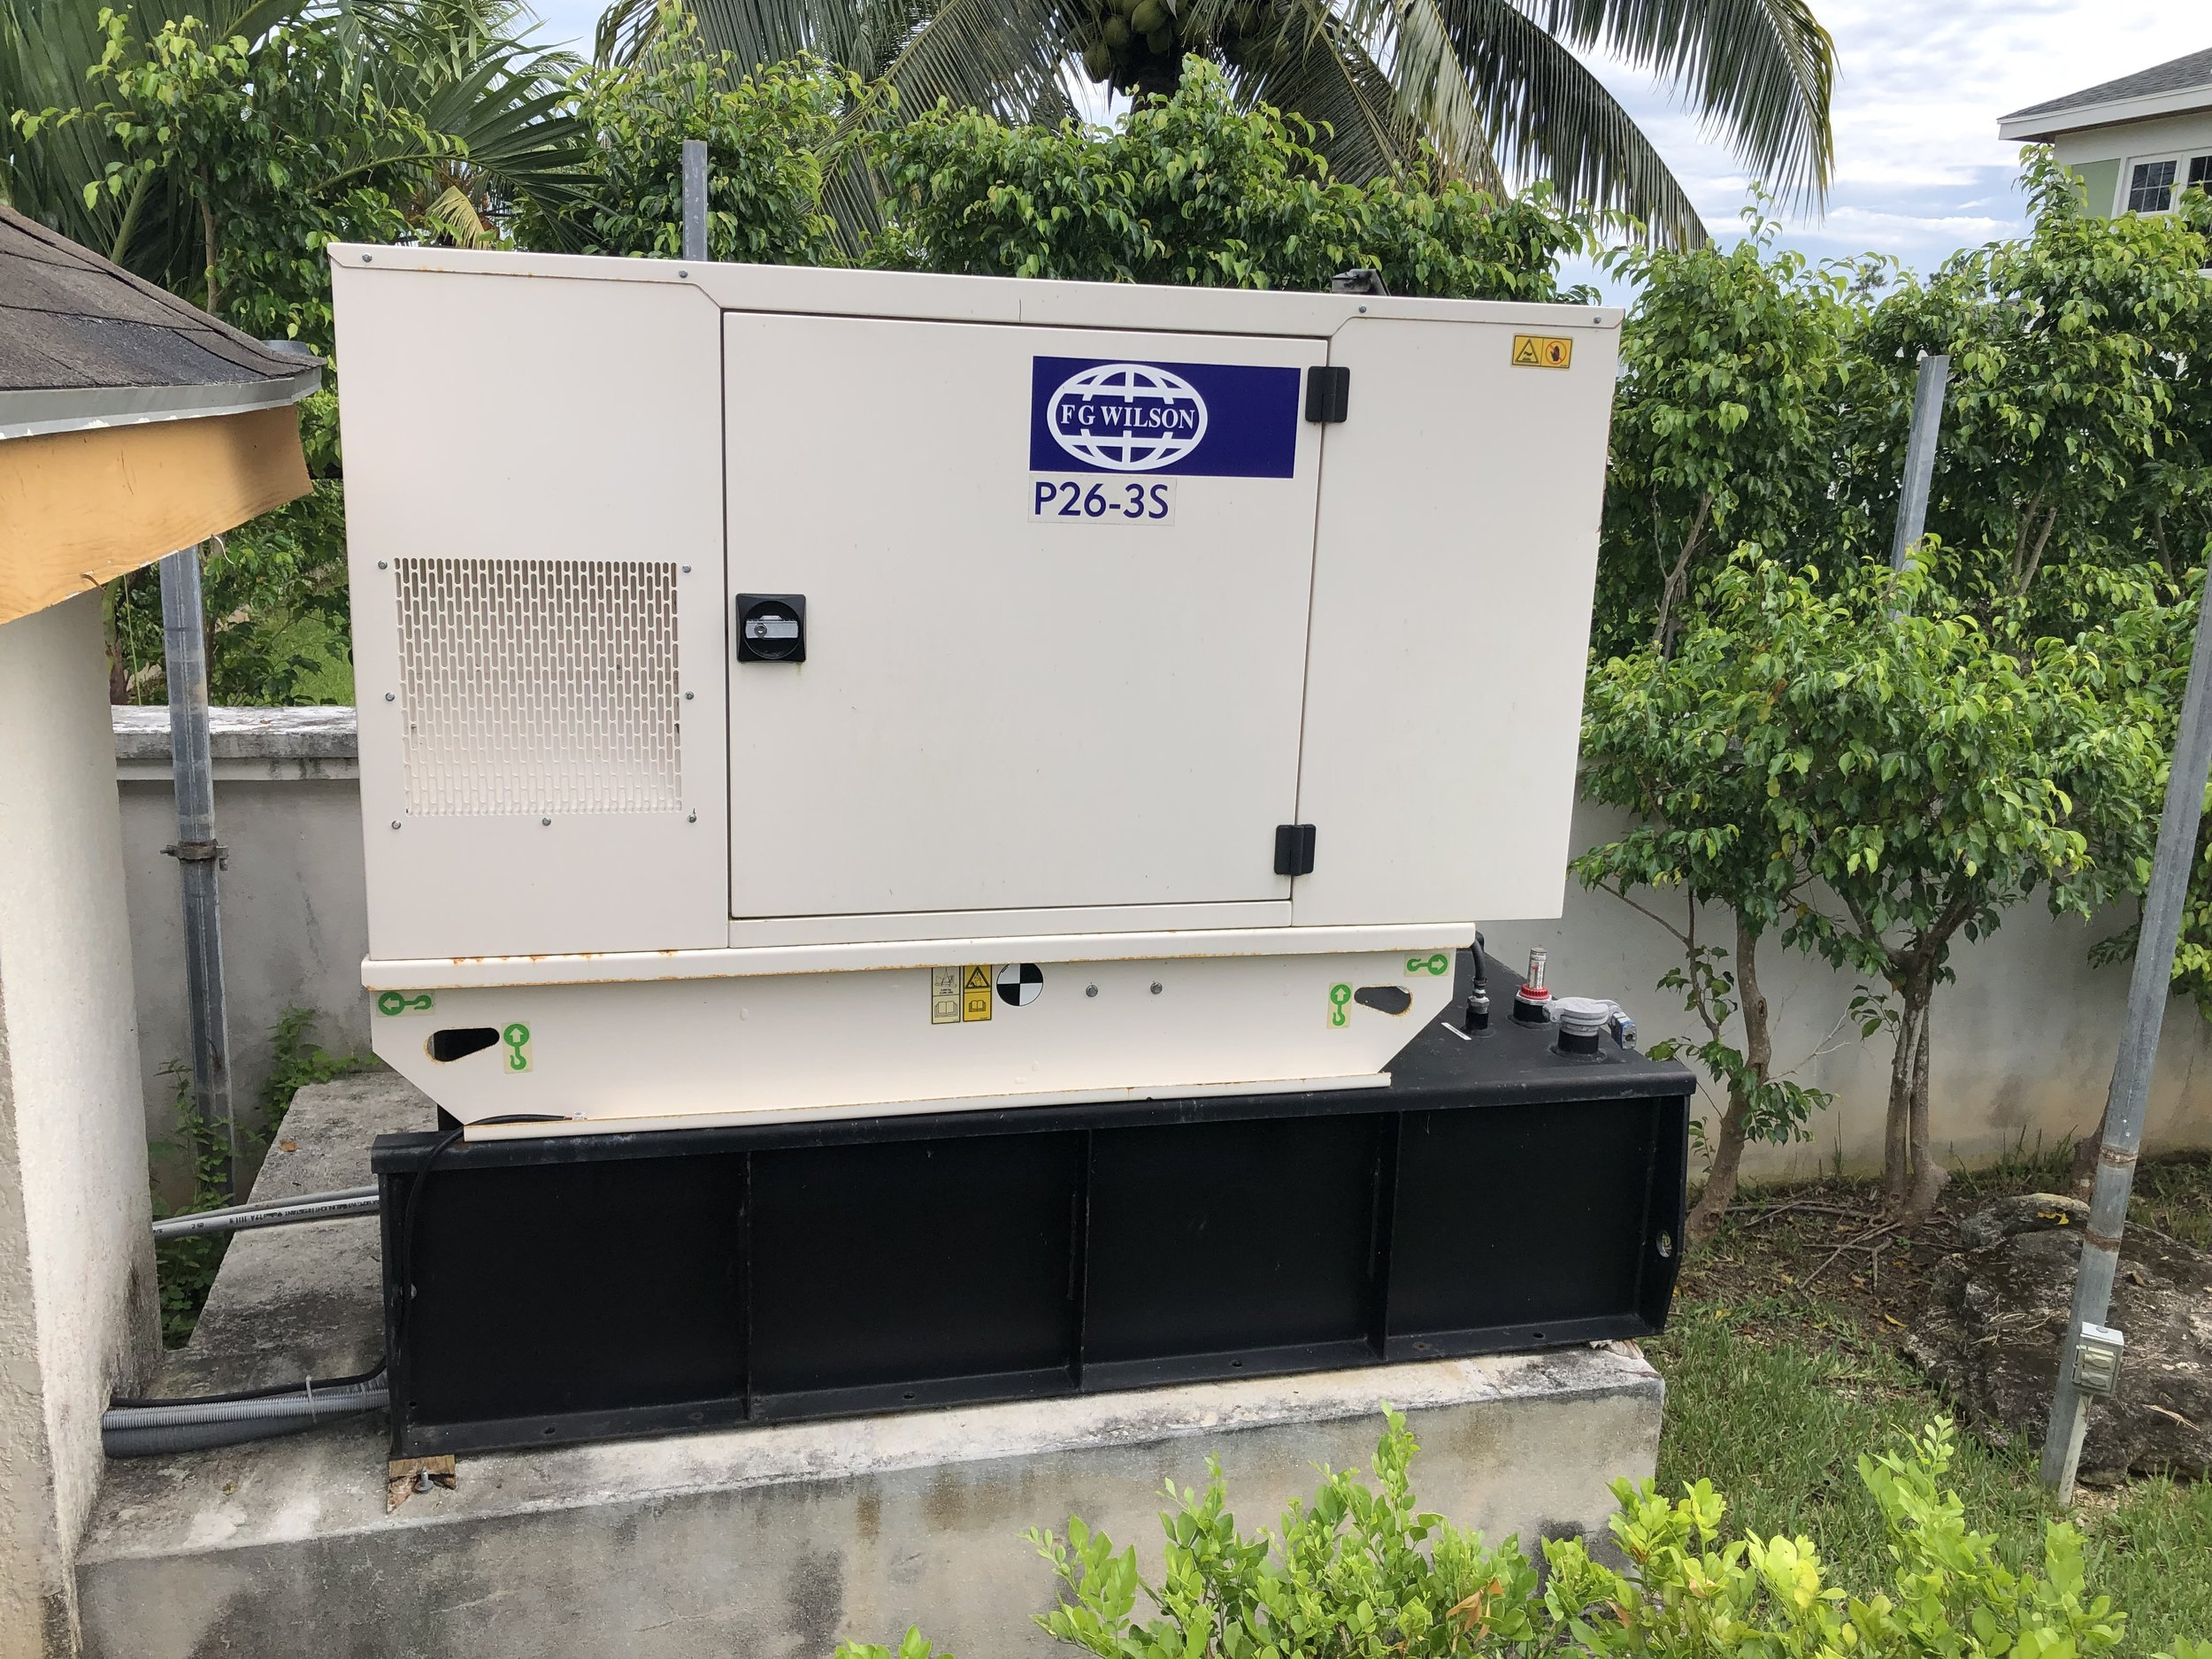 FG Wilson generators installed in The Bahamas